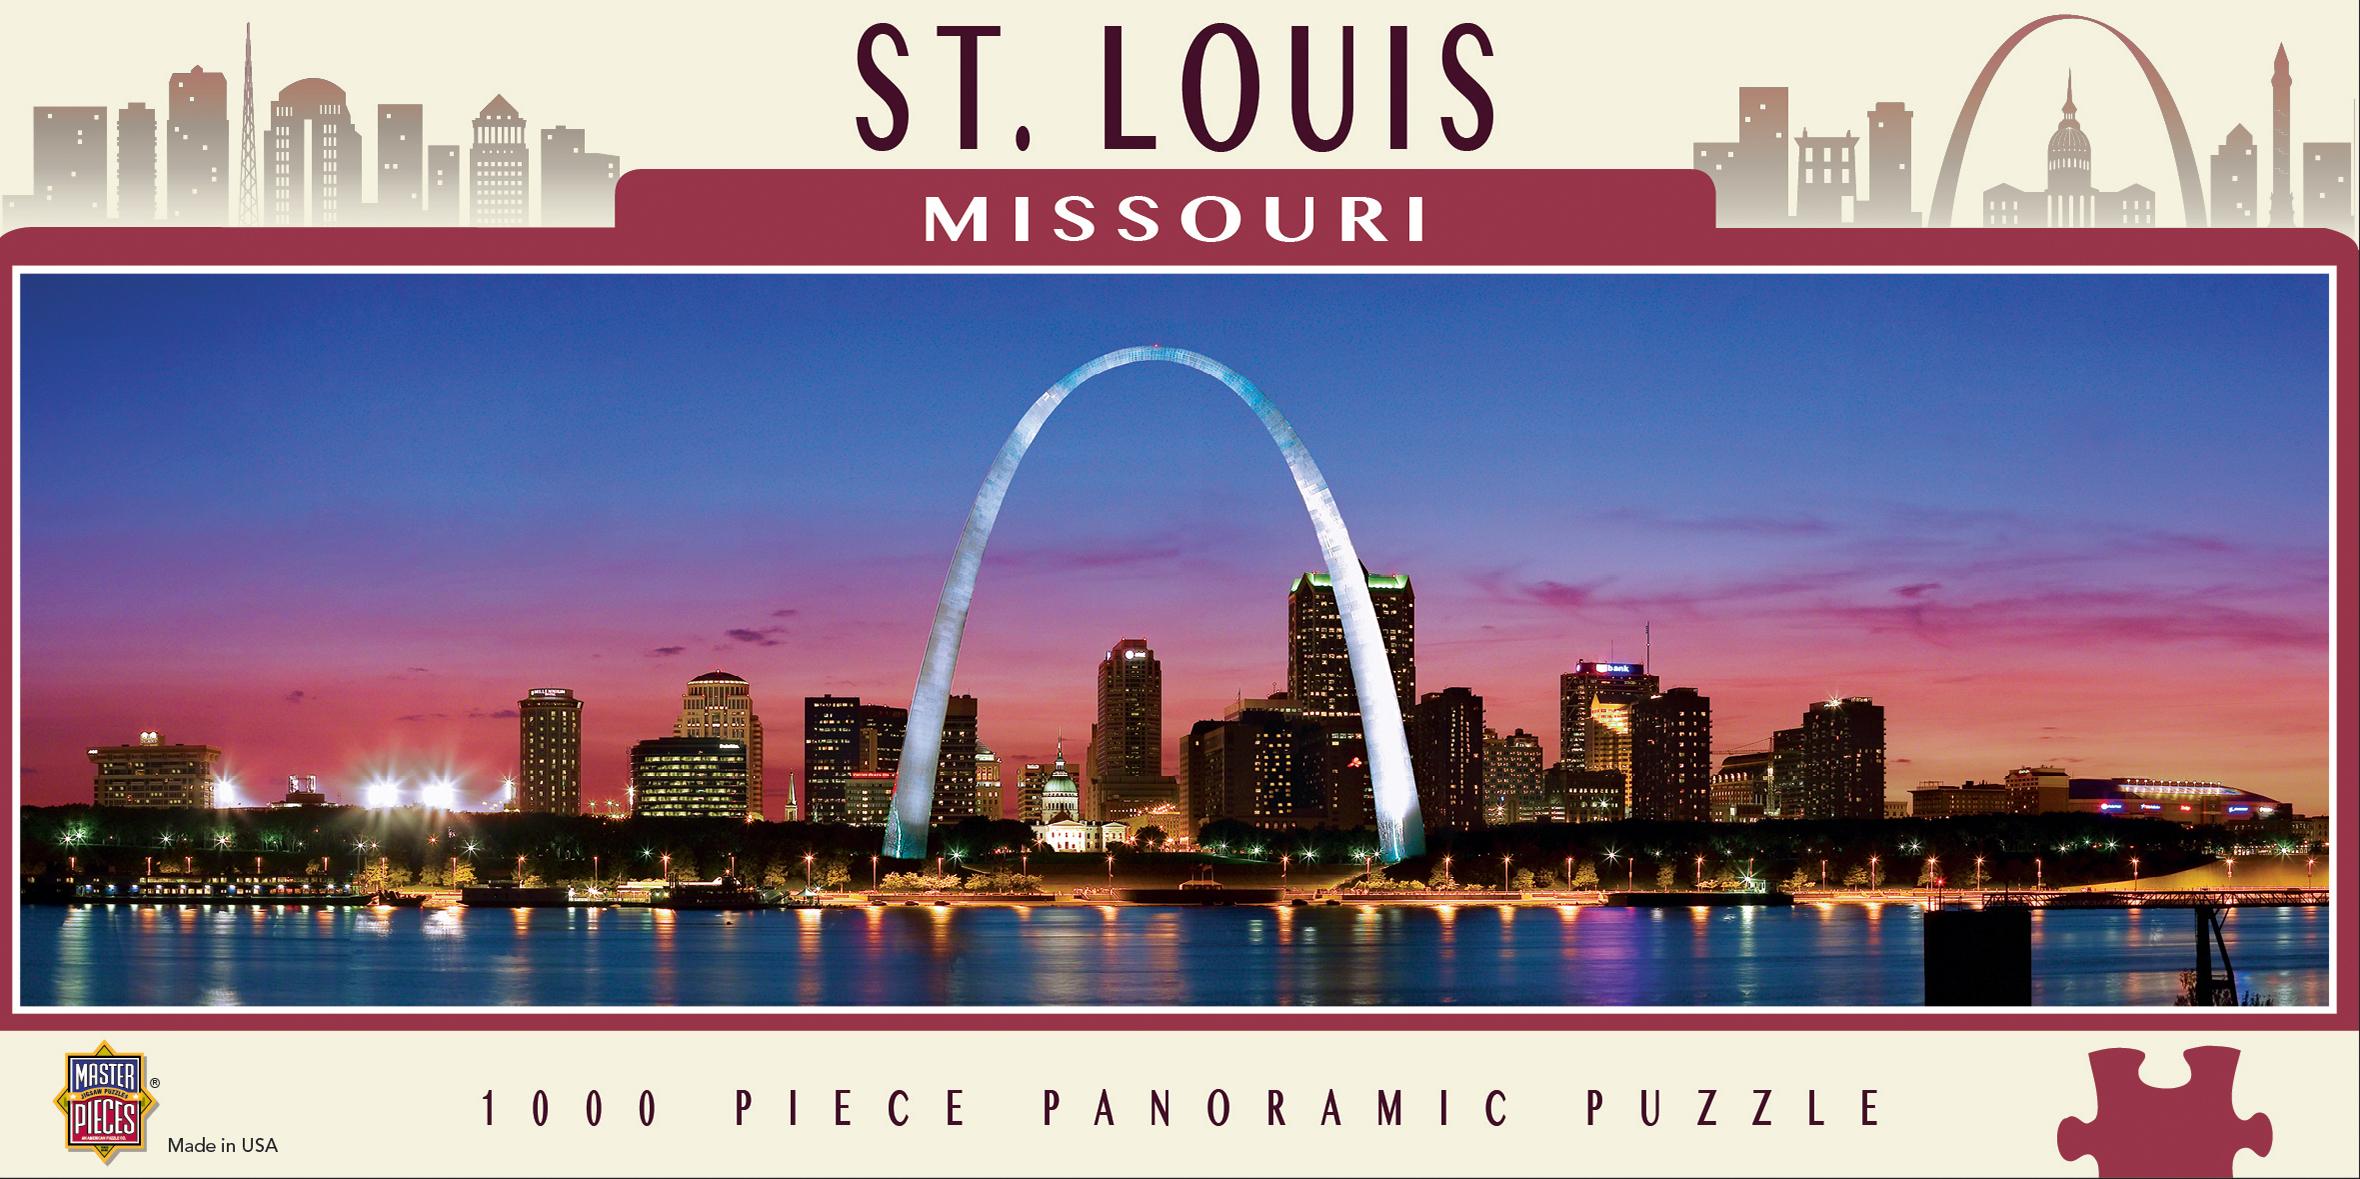 St. Louis Landmarks / Monuments Jigsaw Puzzle